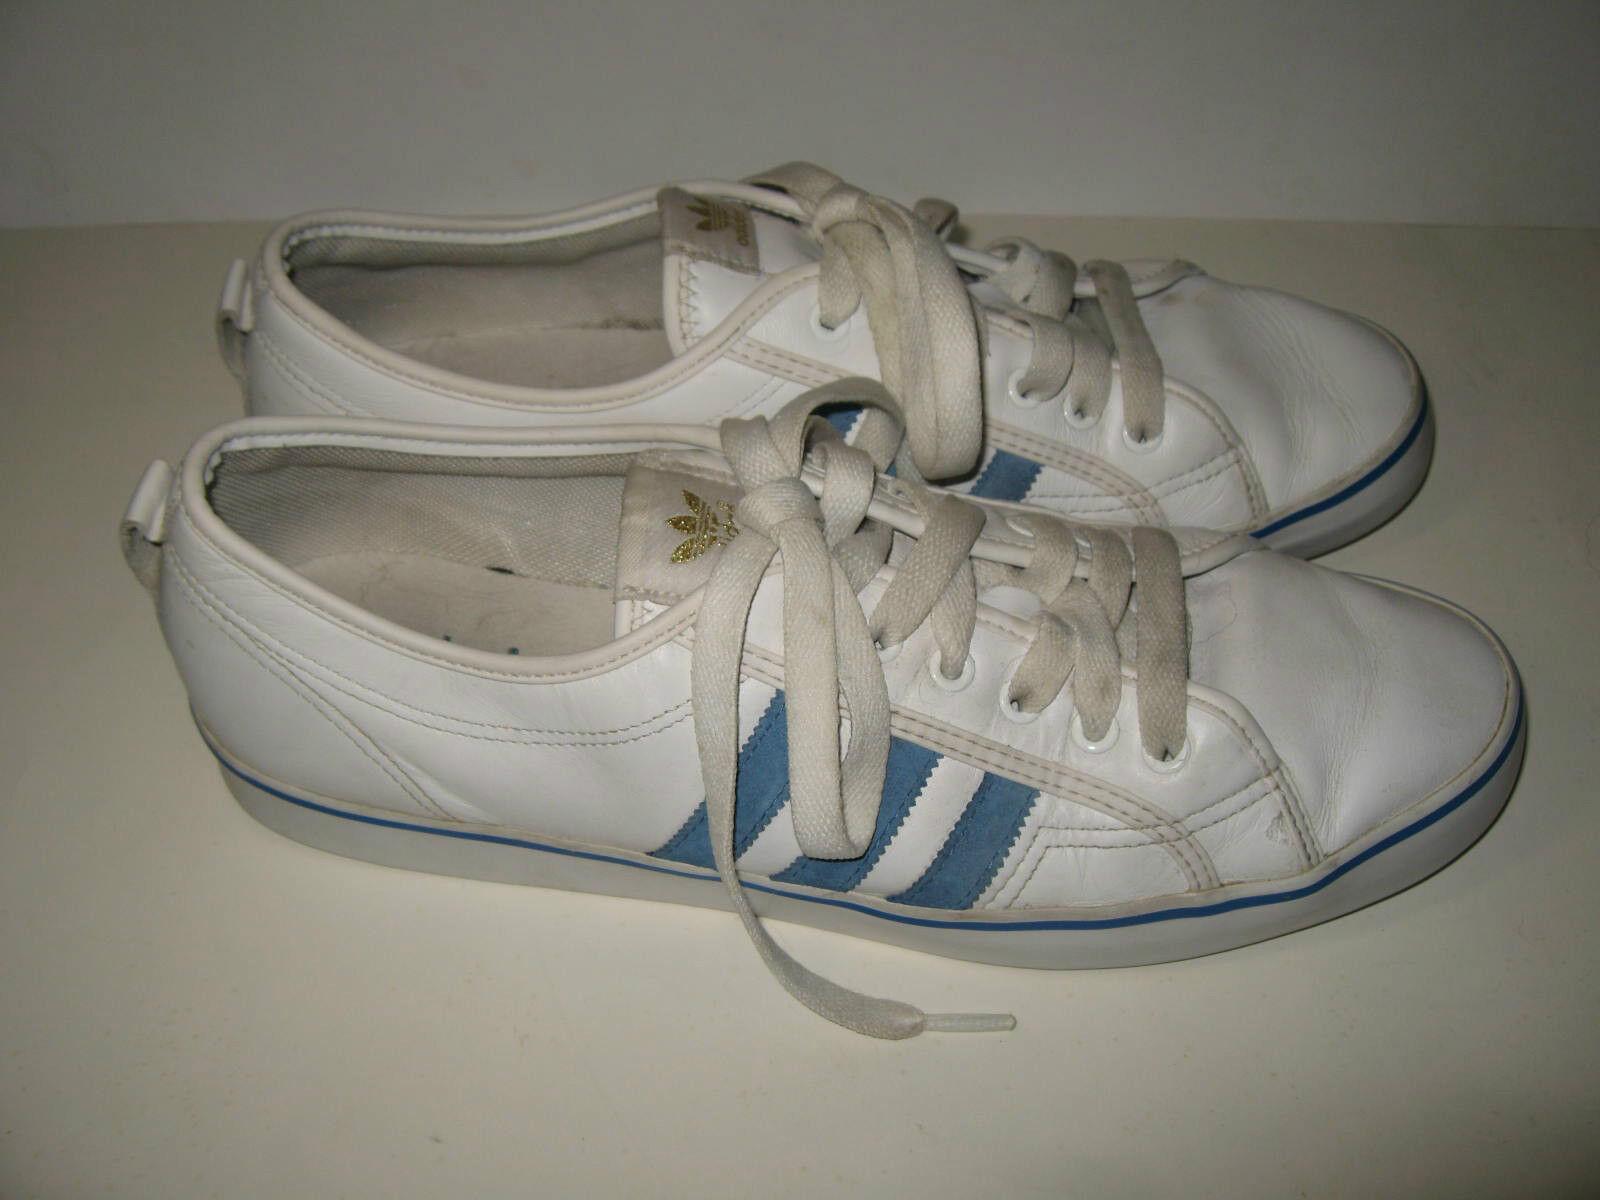 Adidas' niedrigen cl originale weiß - blau - basketball mens. - trainer schuhe größe mens. basketball dce21f